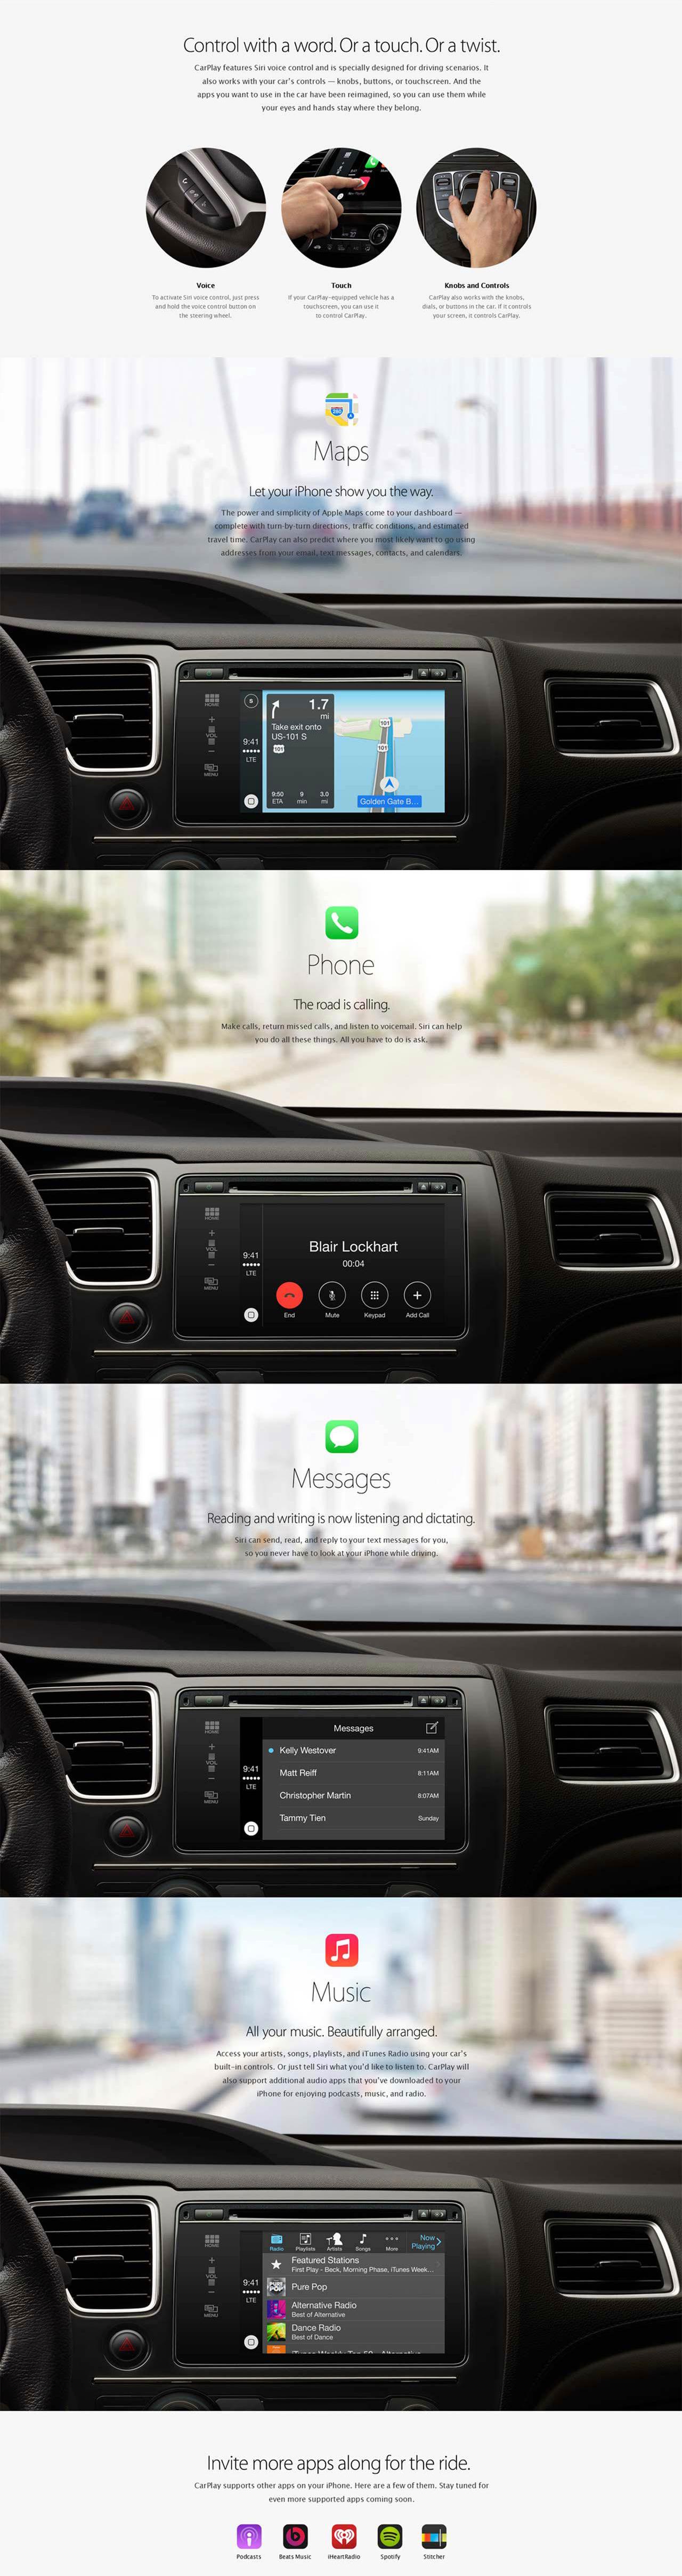 Apple Carplay Connected Car Car Electronics Apple Car Play Carplay Digital Dashboard